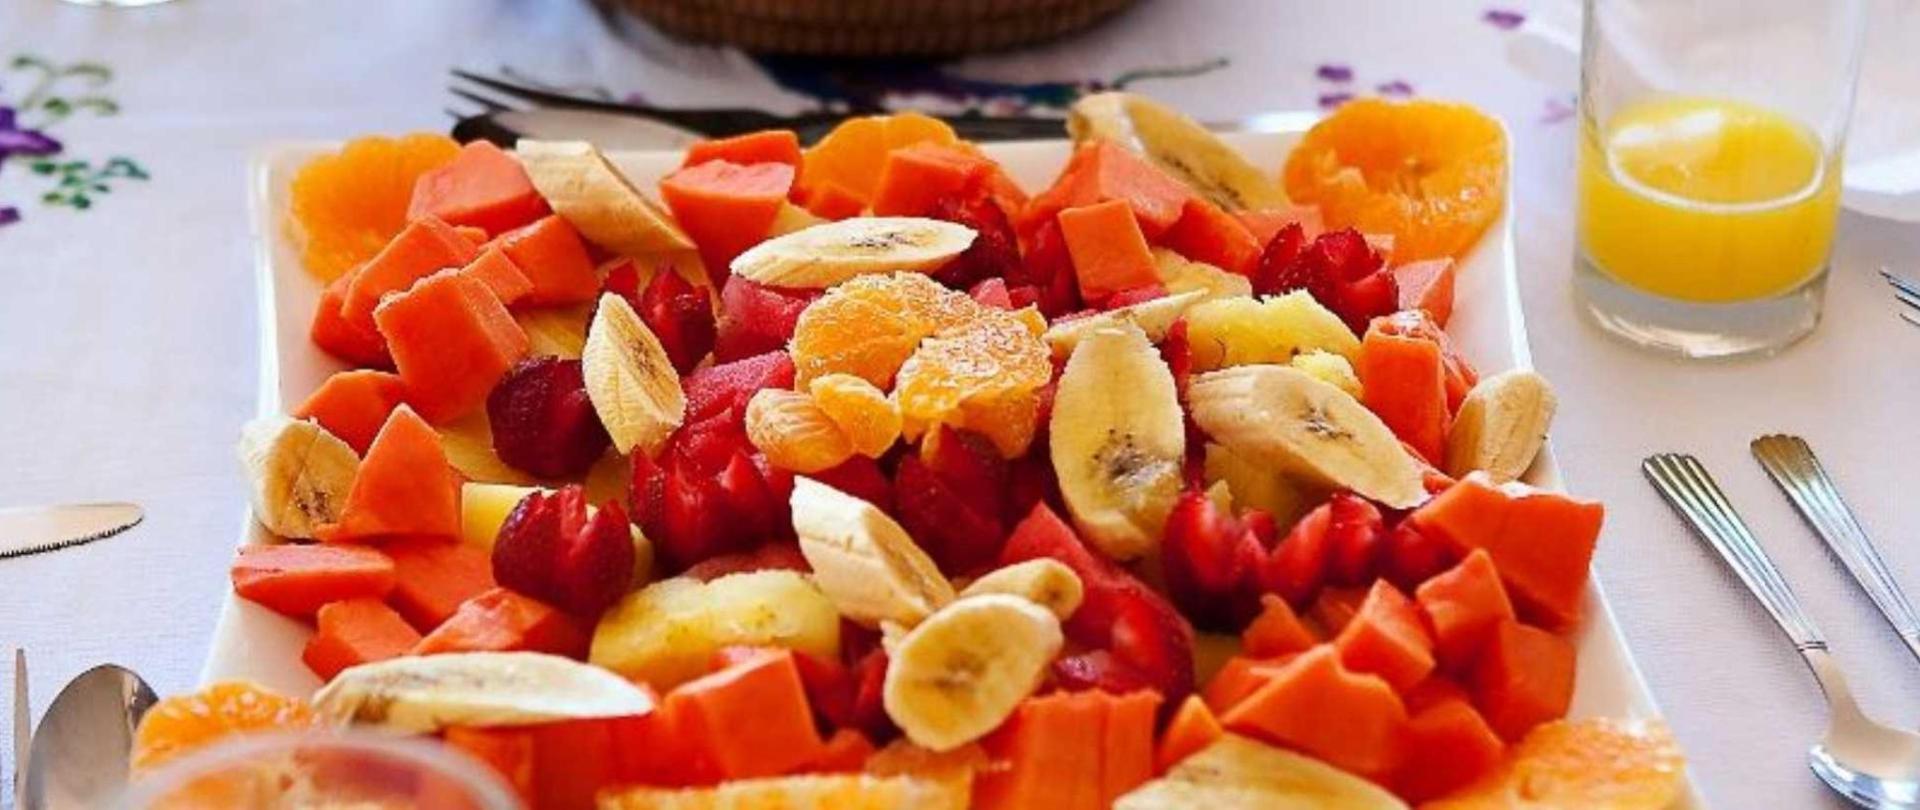 breakfast-fruit-plate1.jpg.1920x807_default.jpg